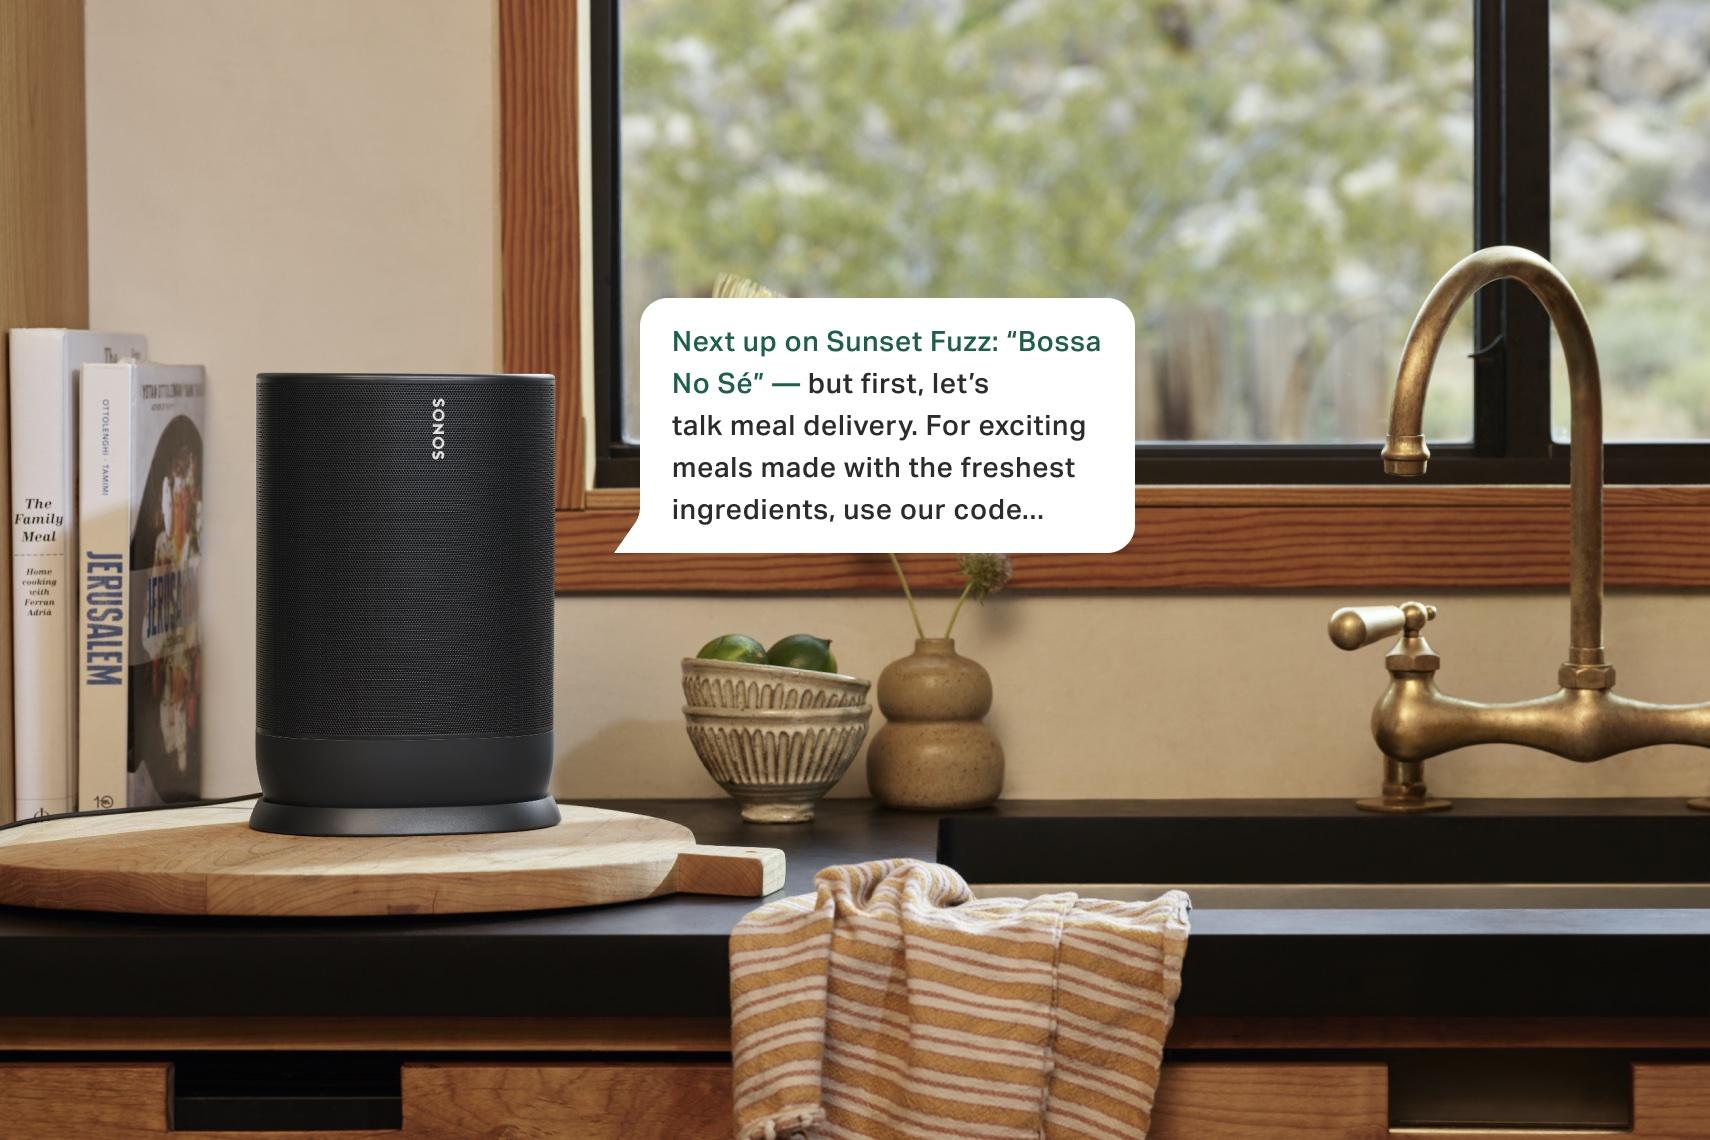 A Sonos smart speaker announcing a message.